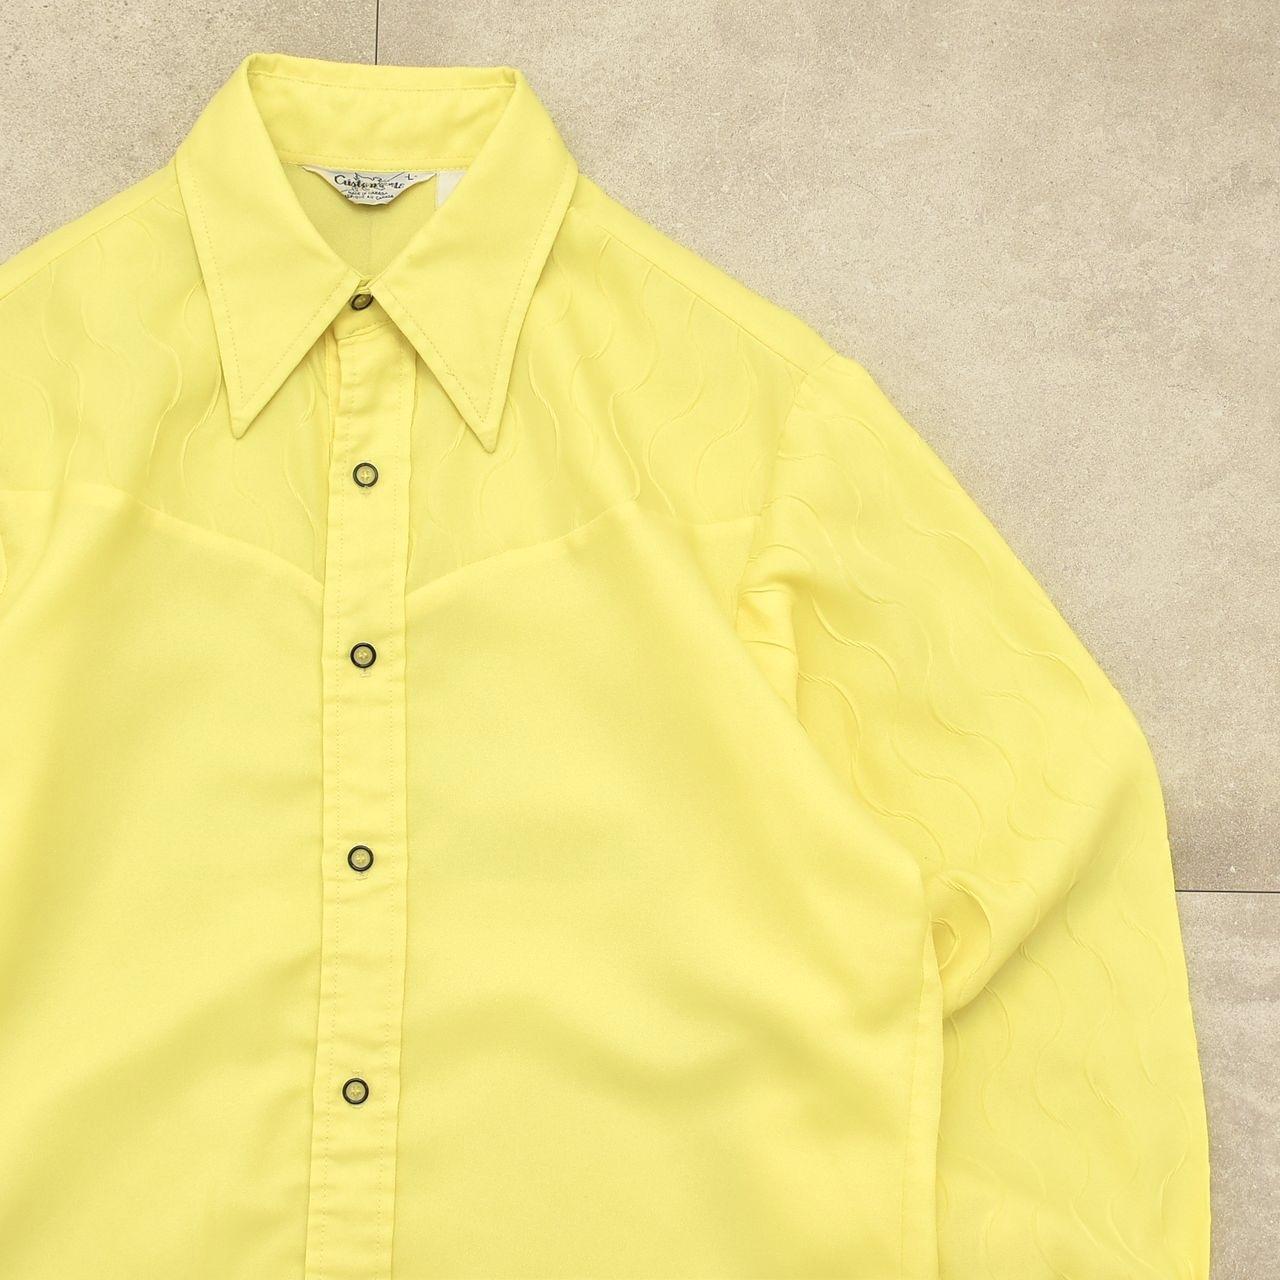 70's Customode wave stripe design shirt